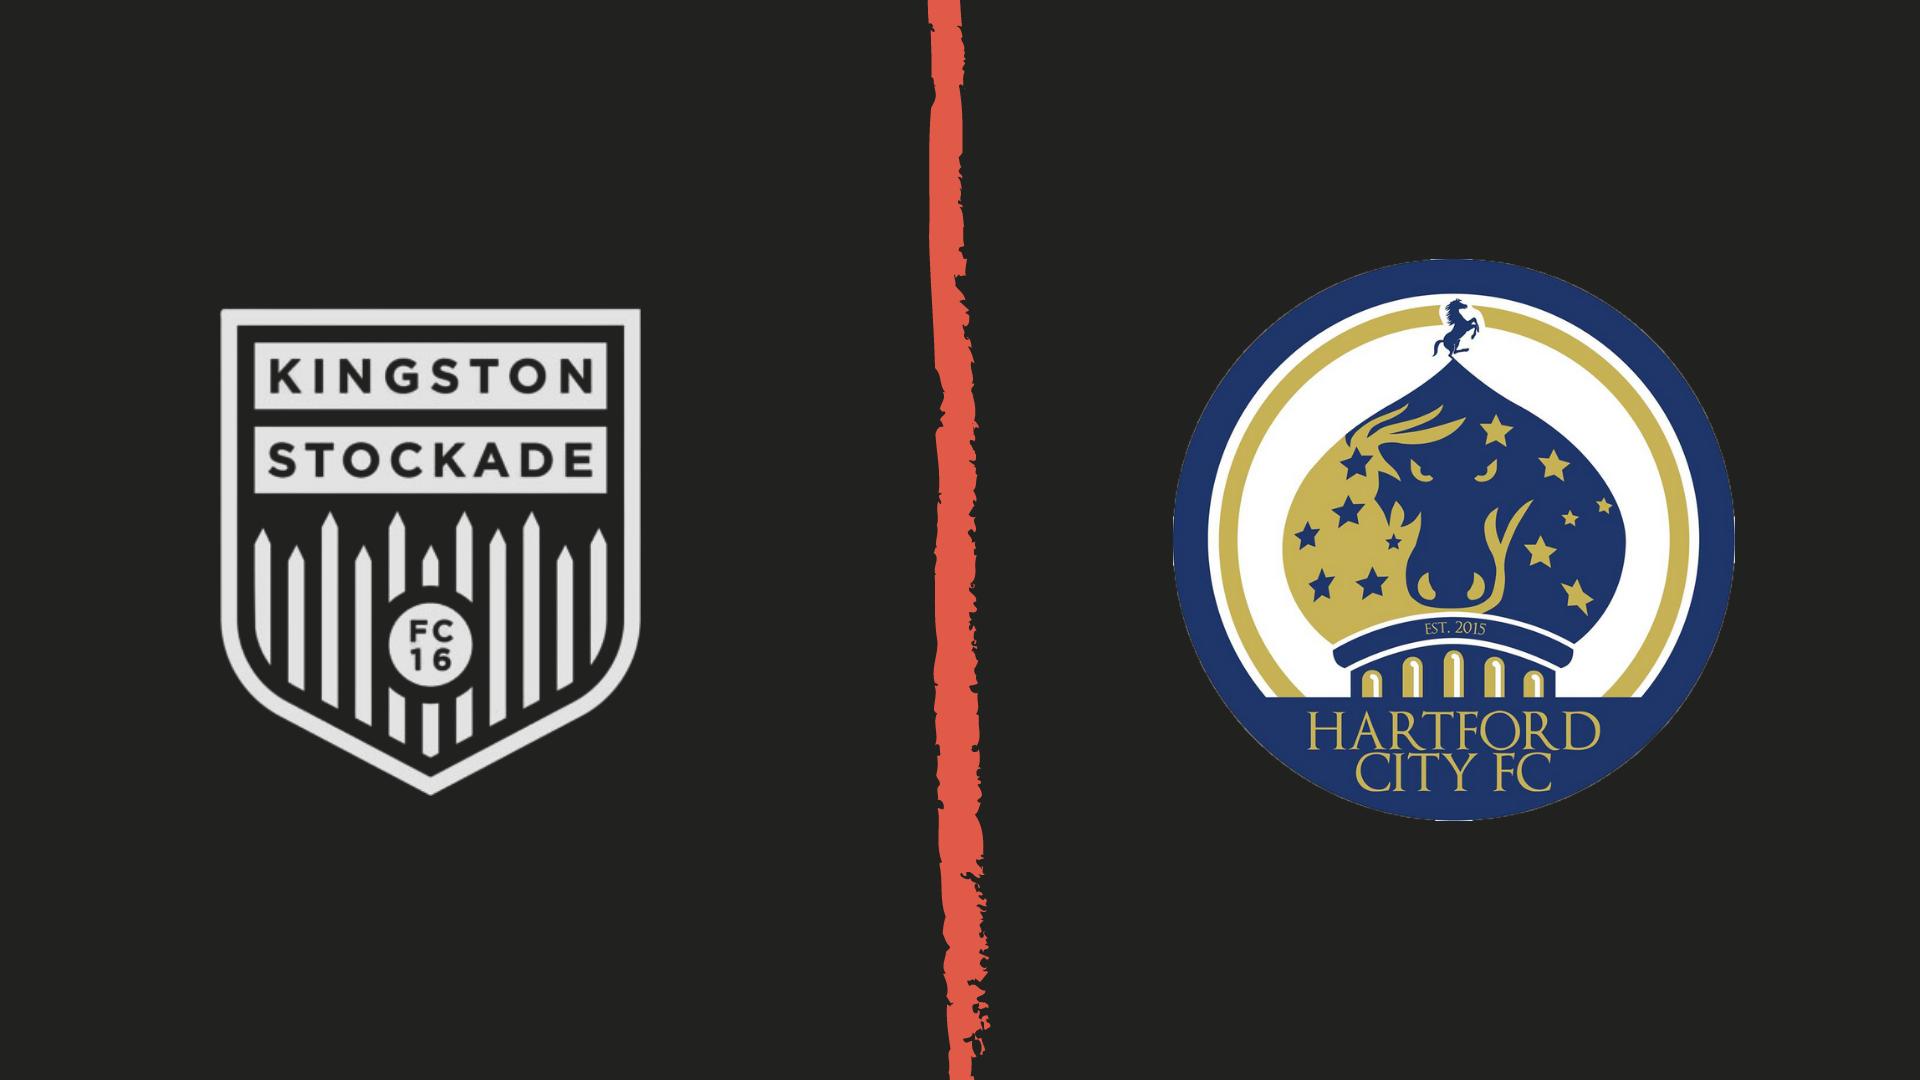 Kingston Stockade FC vs Hartford City